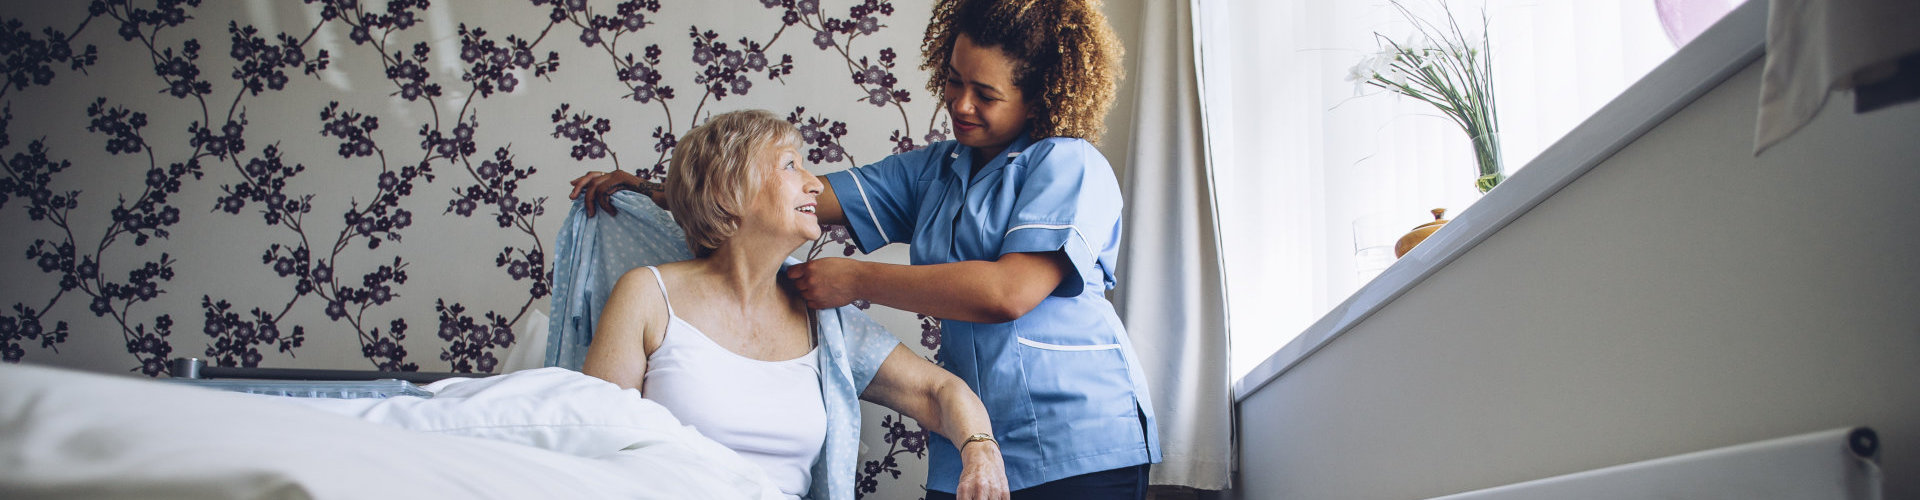 caregiver helping a senior woman dress up